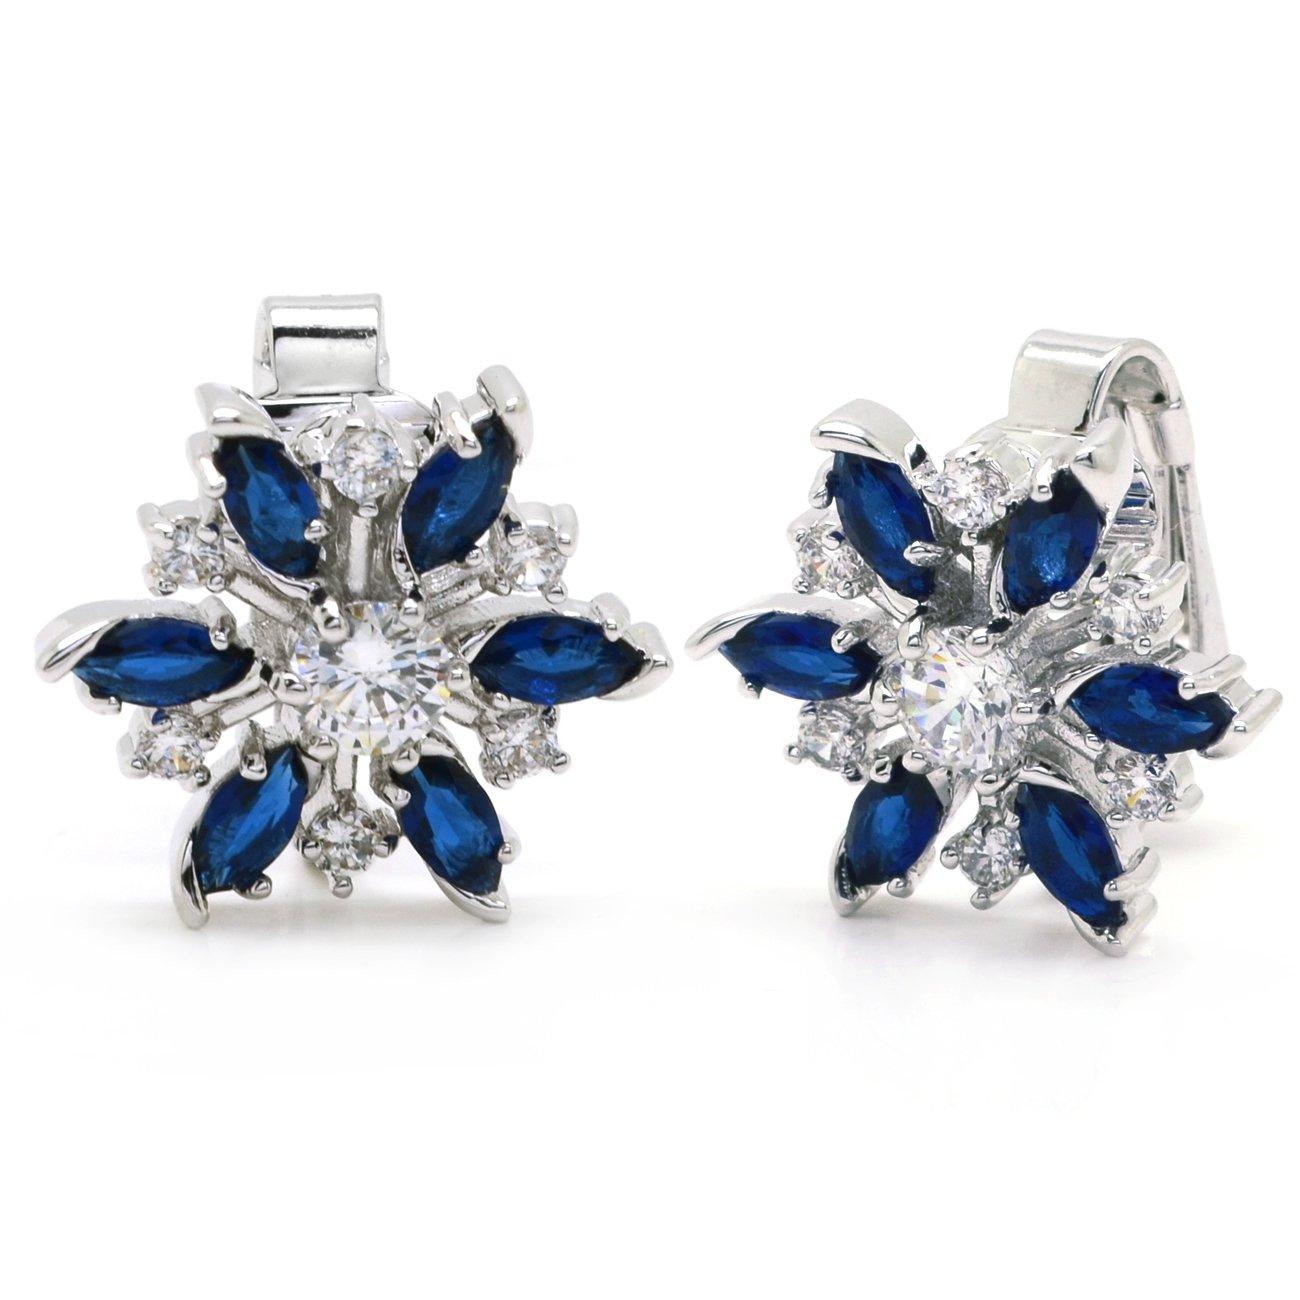 Blue Snowflake Clip On Earrings Holiday Christmas CZ Women Fashion